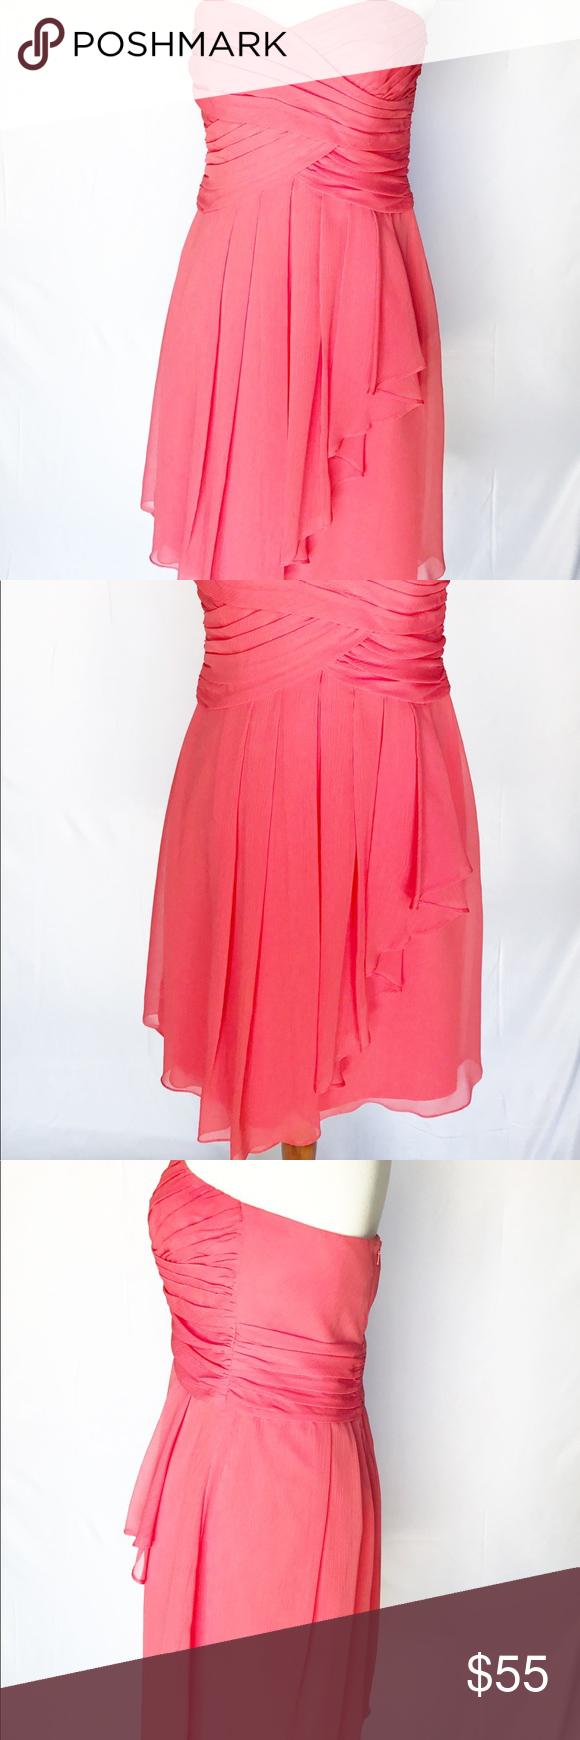 Peach Chiffon Tube Top Dress   My Posh Closet   Pinterest